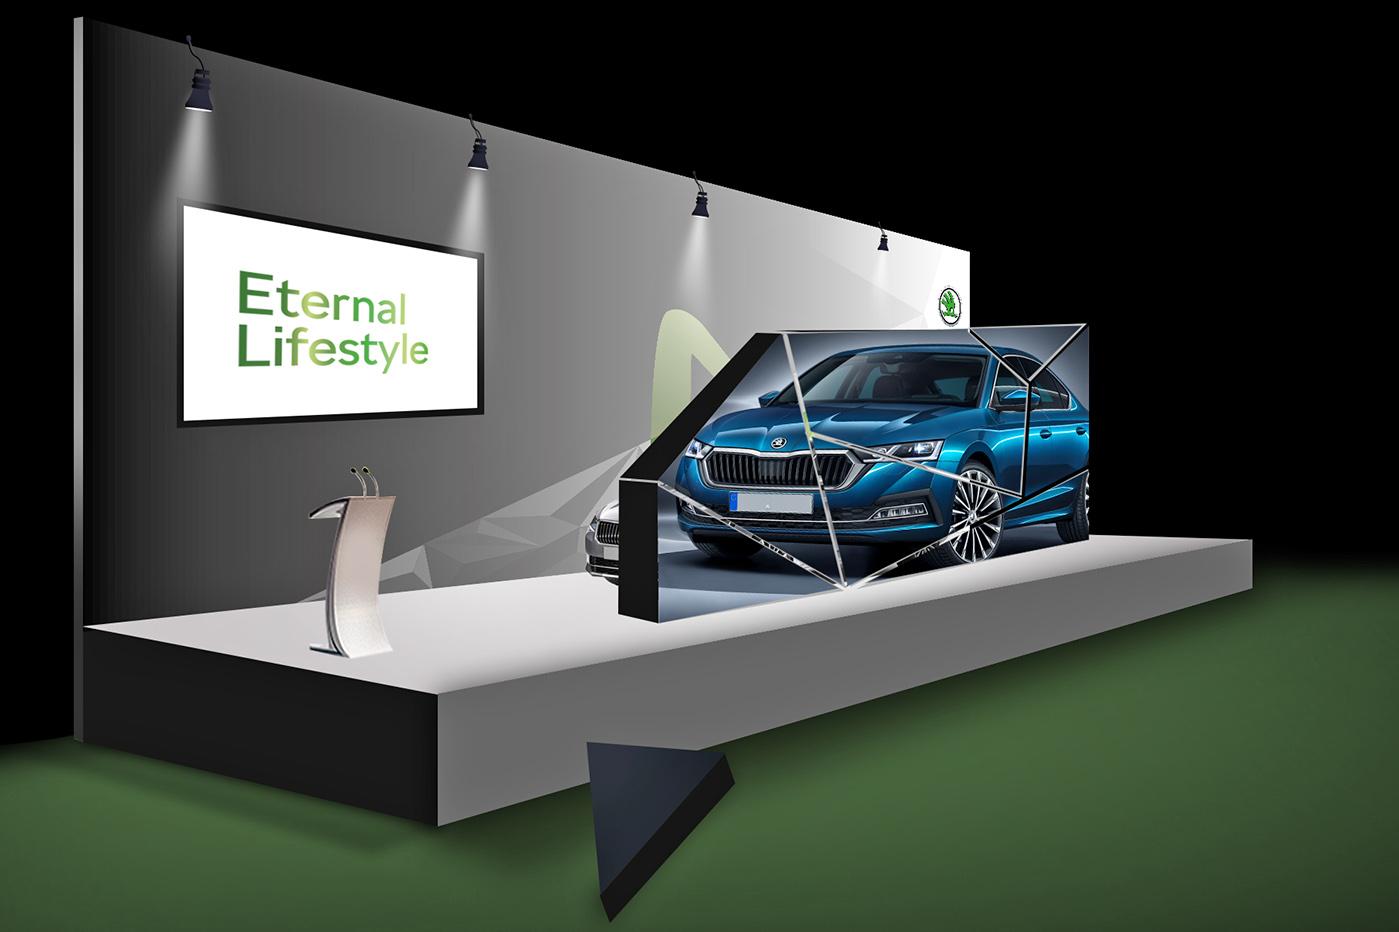 schareinprojekt-vip-event-auto-automotive-präsentation-stage-bühne